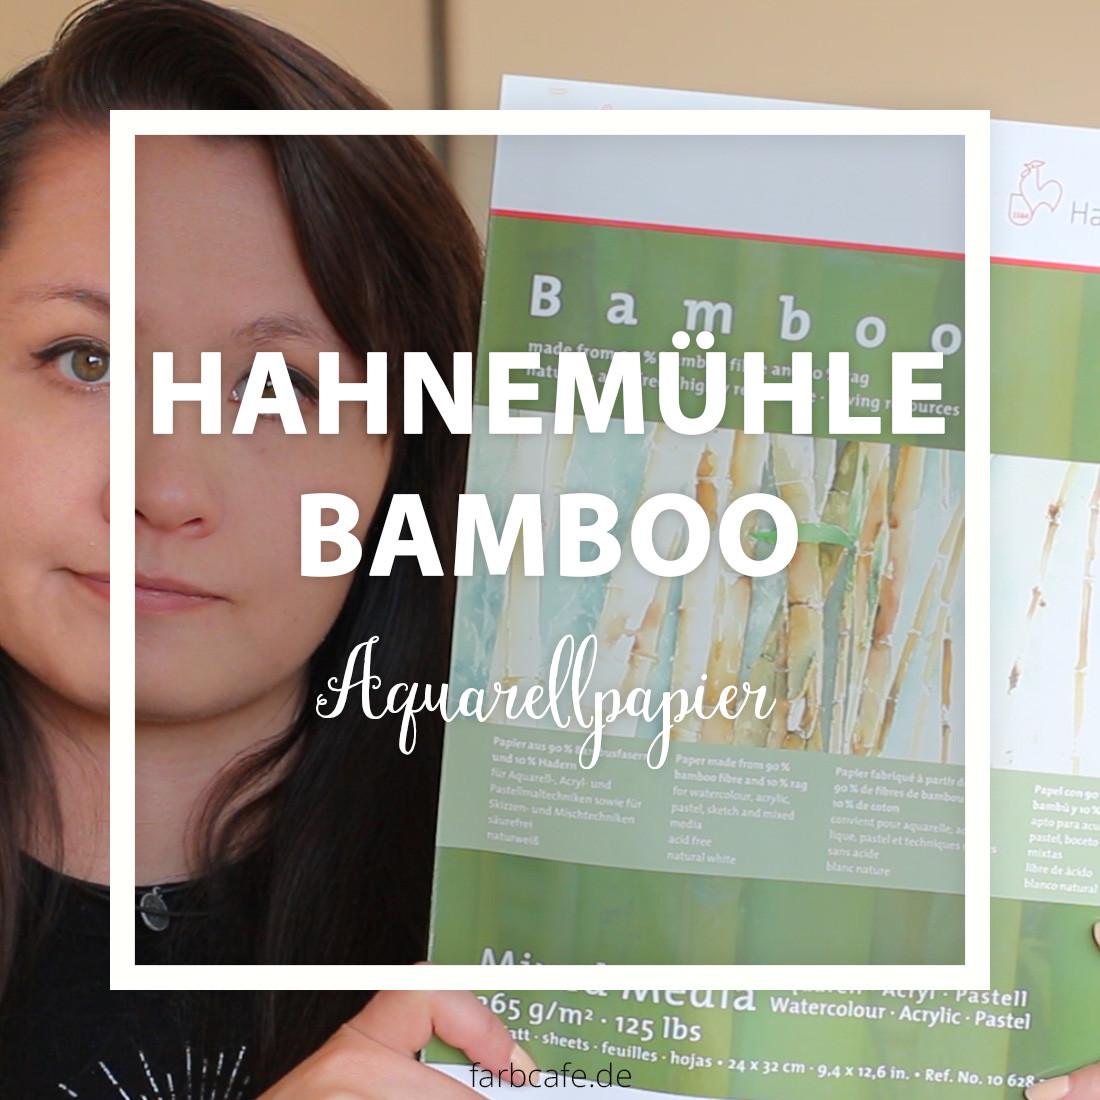 Hahnemühle Bamboo Mixed Media Testbericht auf FarbCafé